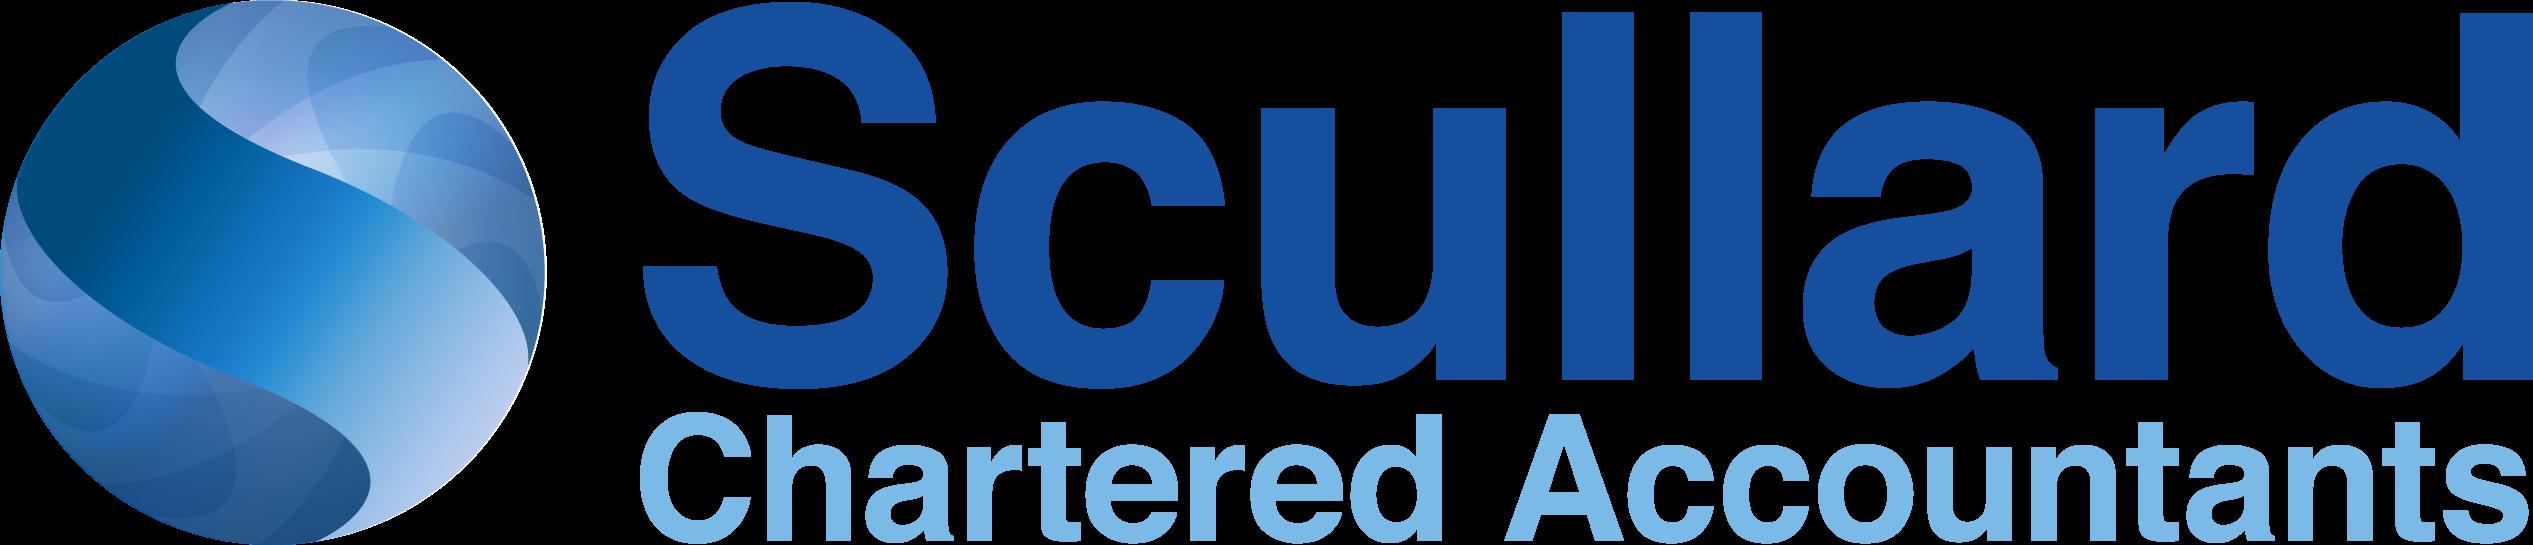 Scullard Chartered Accountants Logo